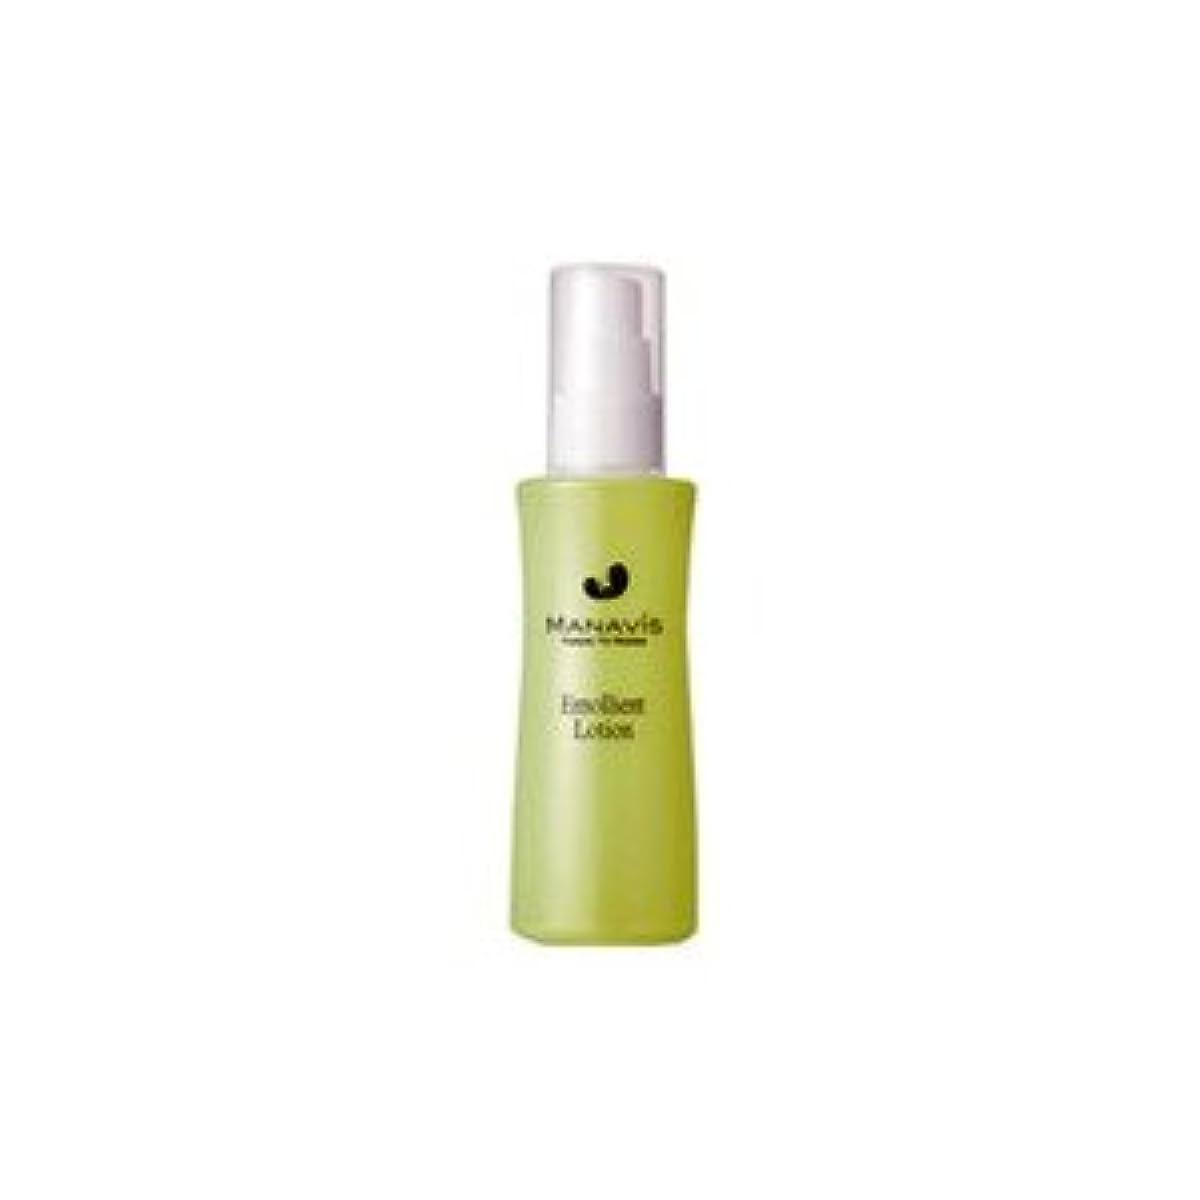 MANAVIS マナビス化粧品 薬用 エモリエントローション EX  化粧水